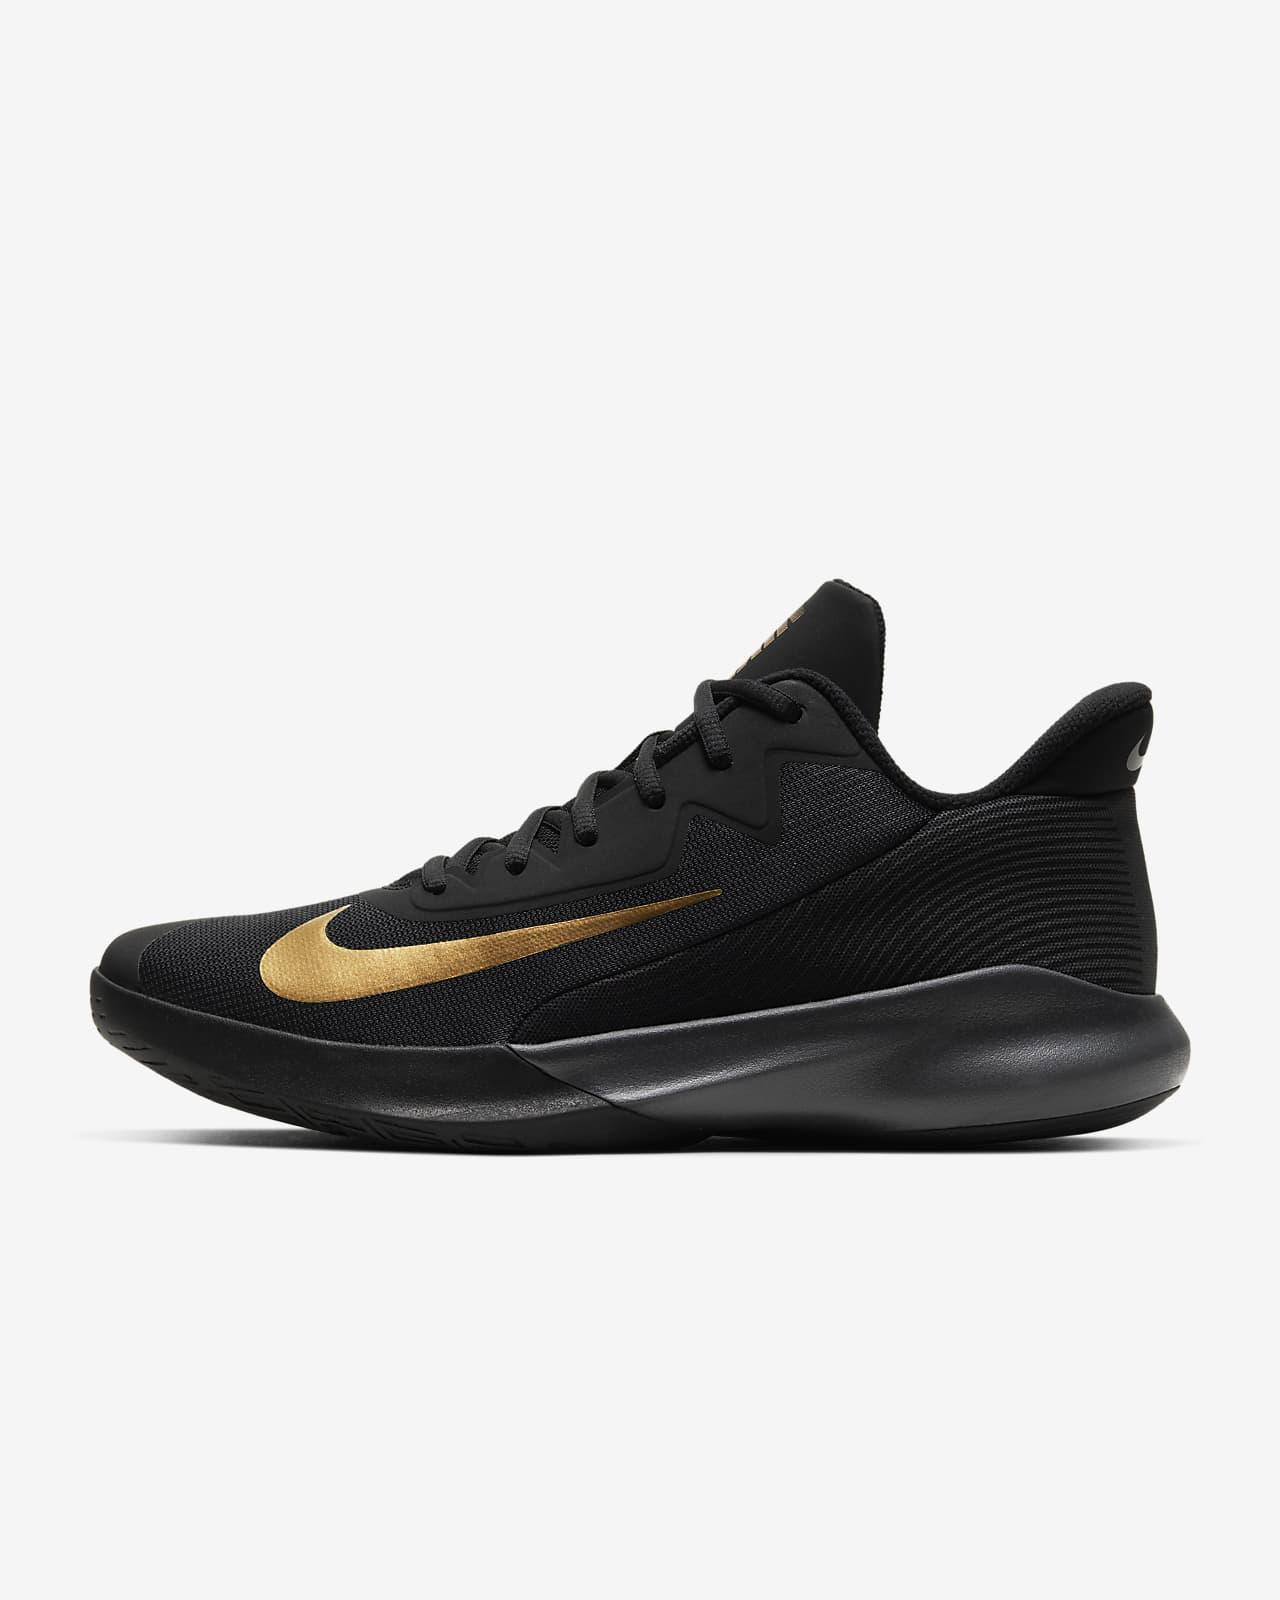 Nike Precision 4 Basketball Shoes